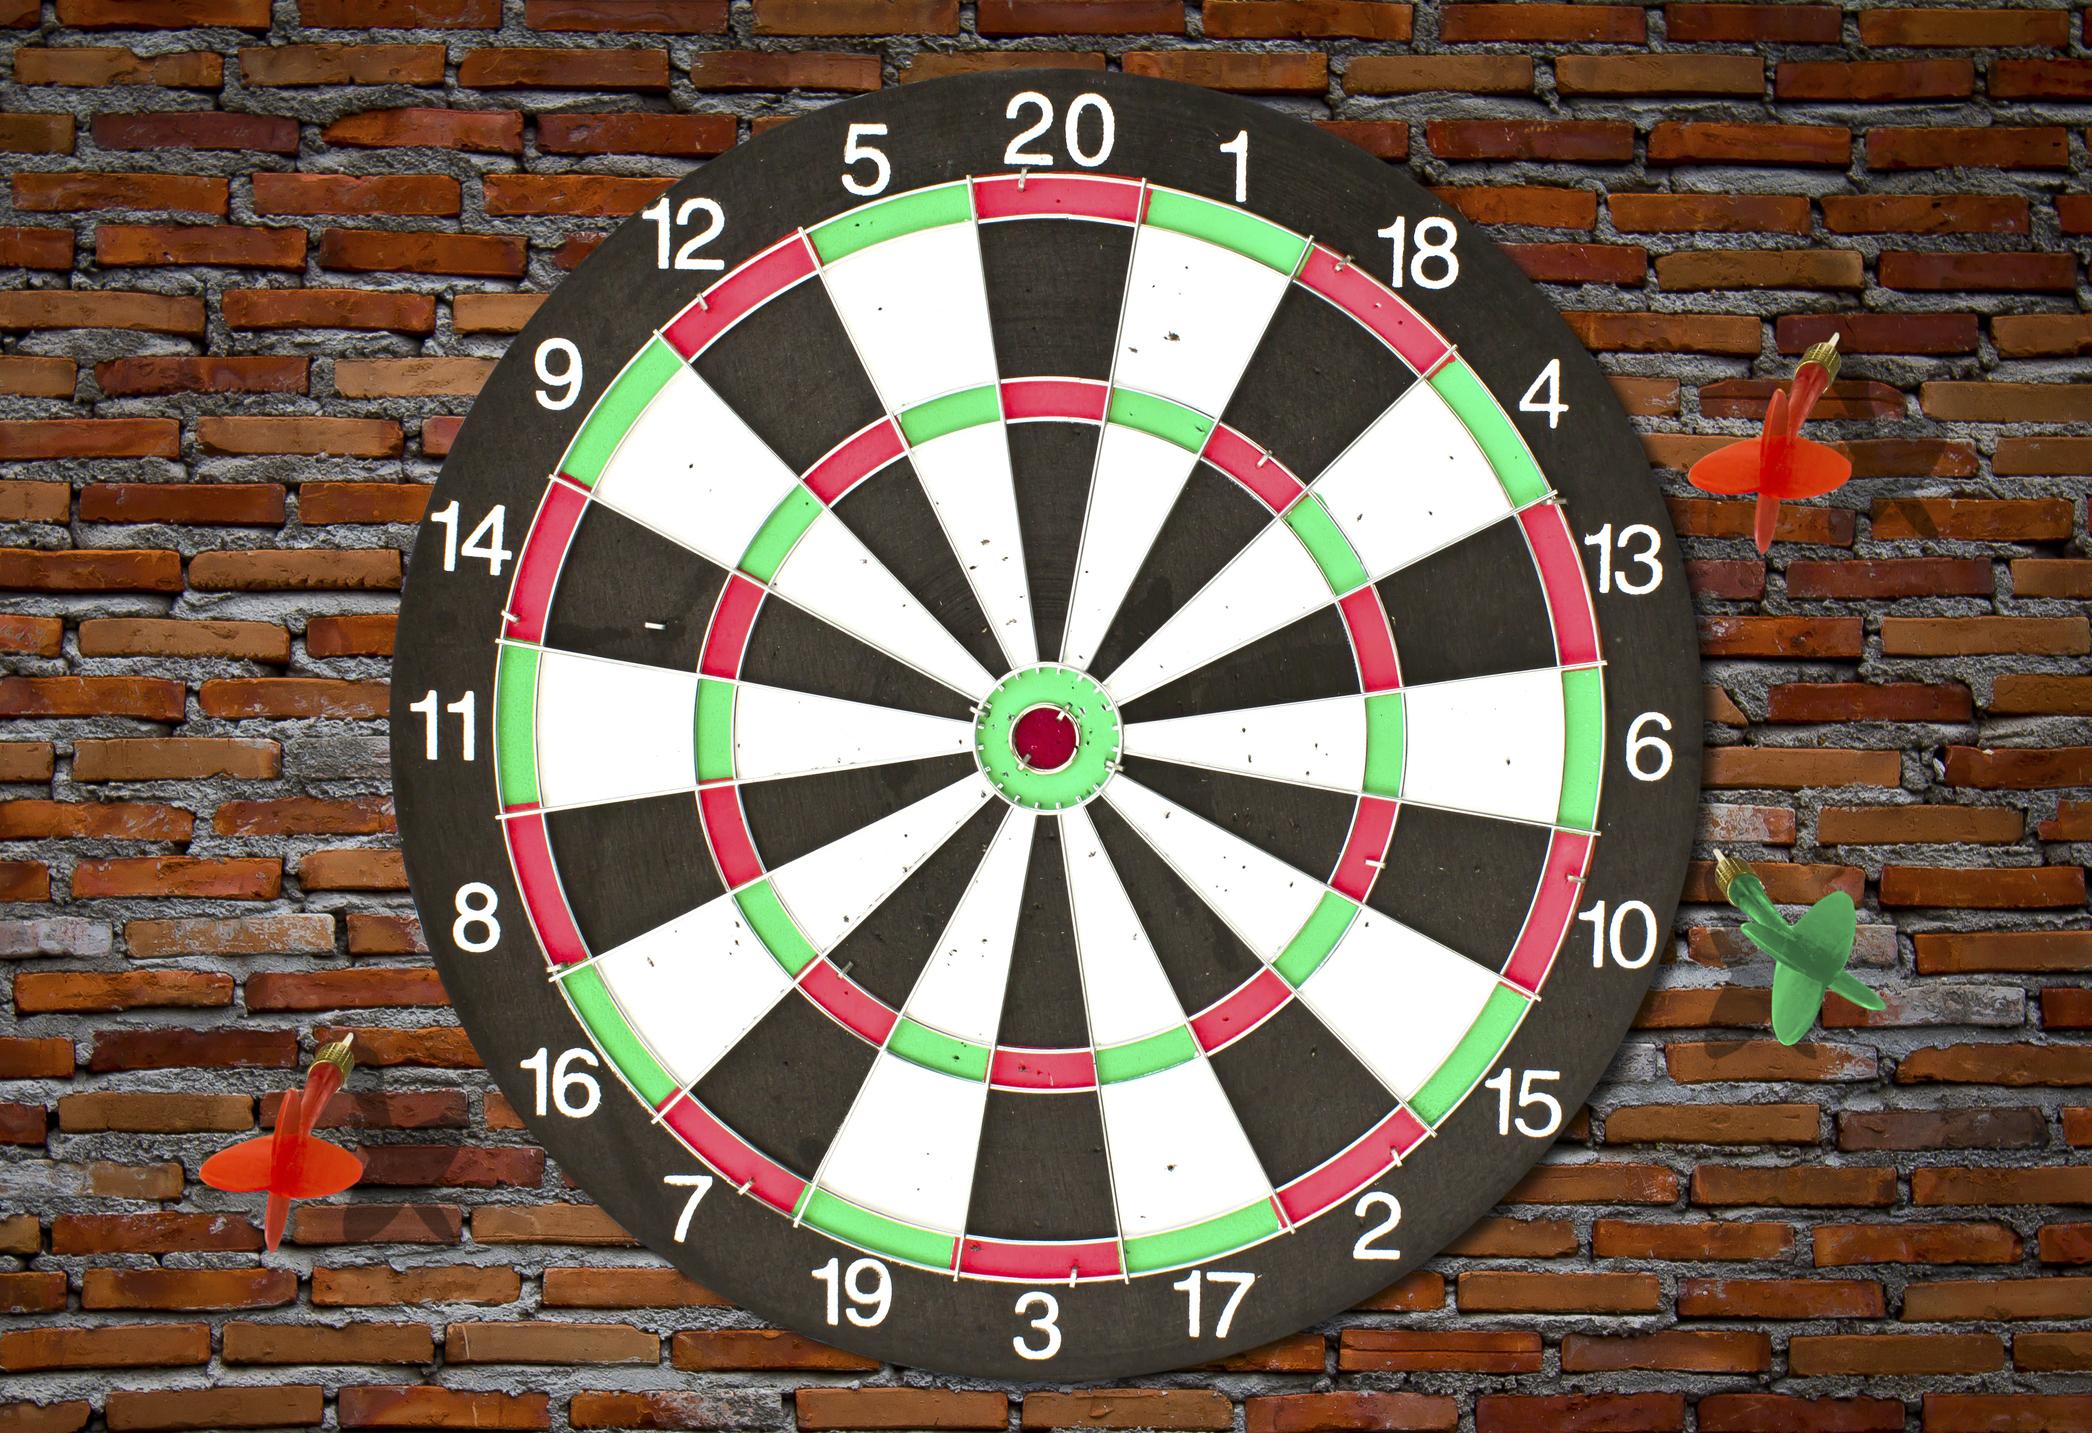 Thrown darts badly miss the dartboard.